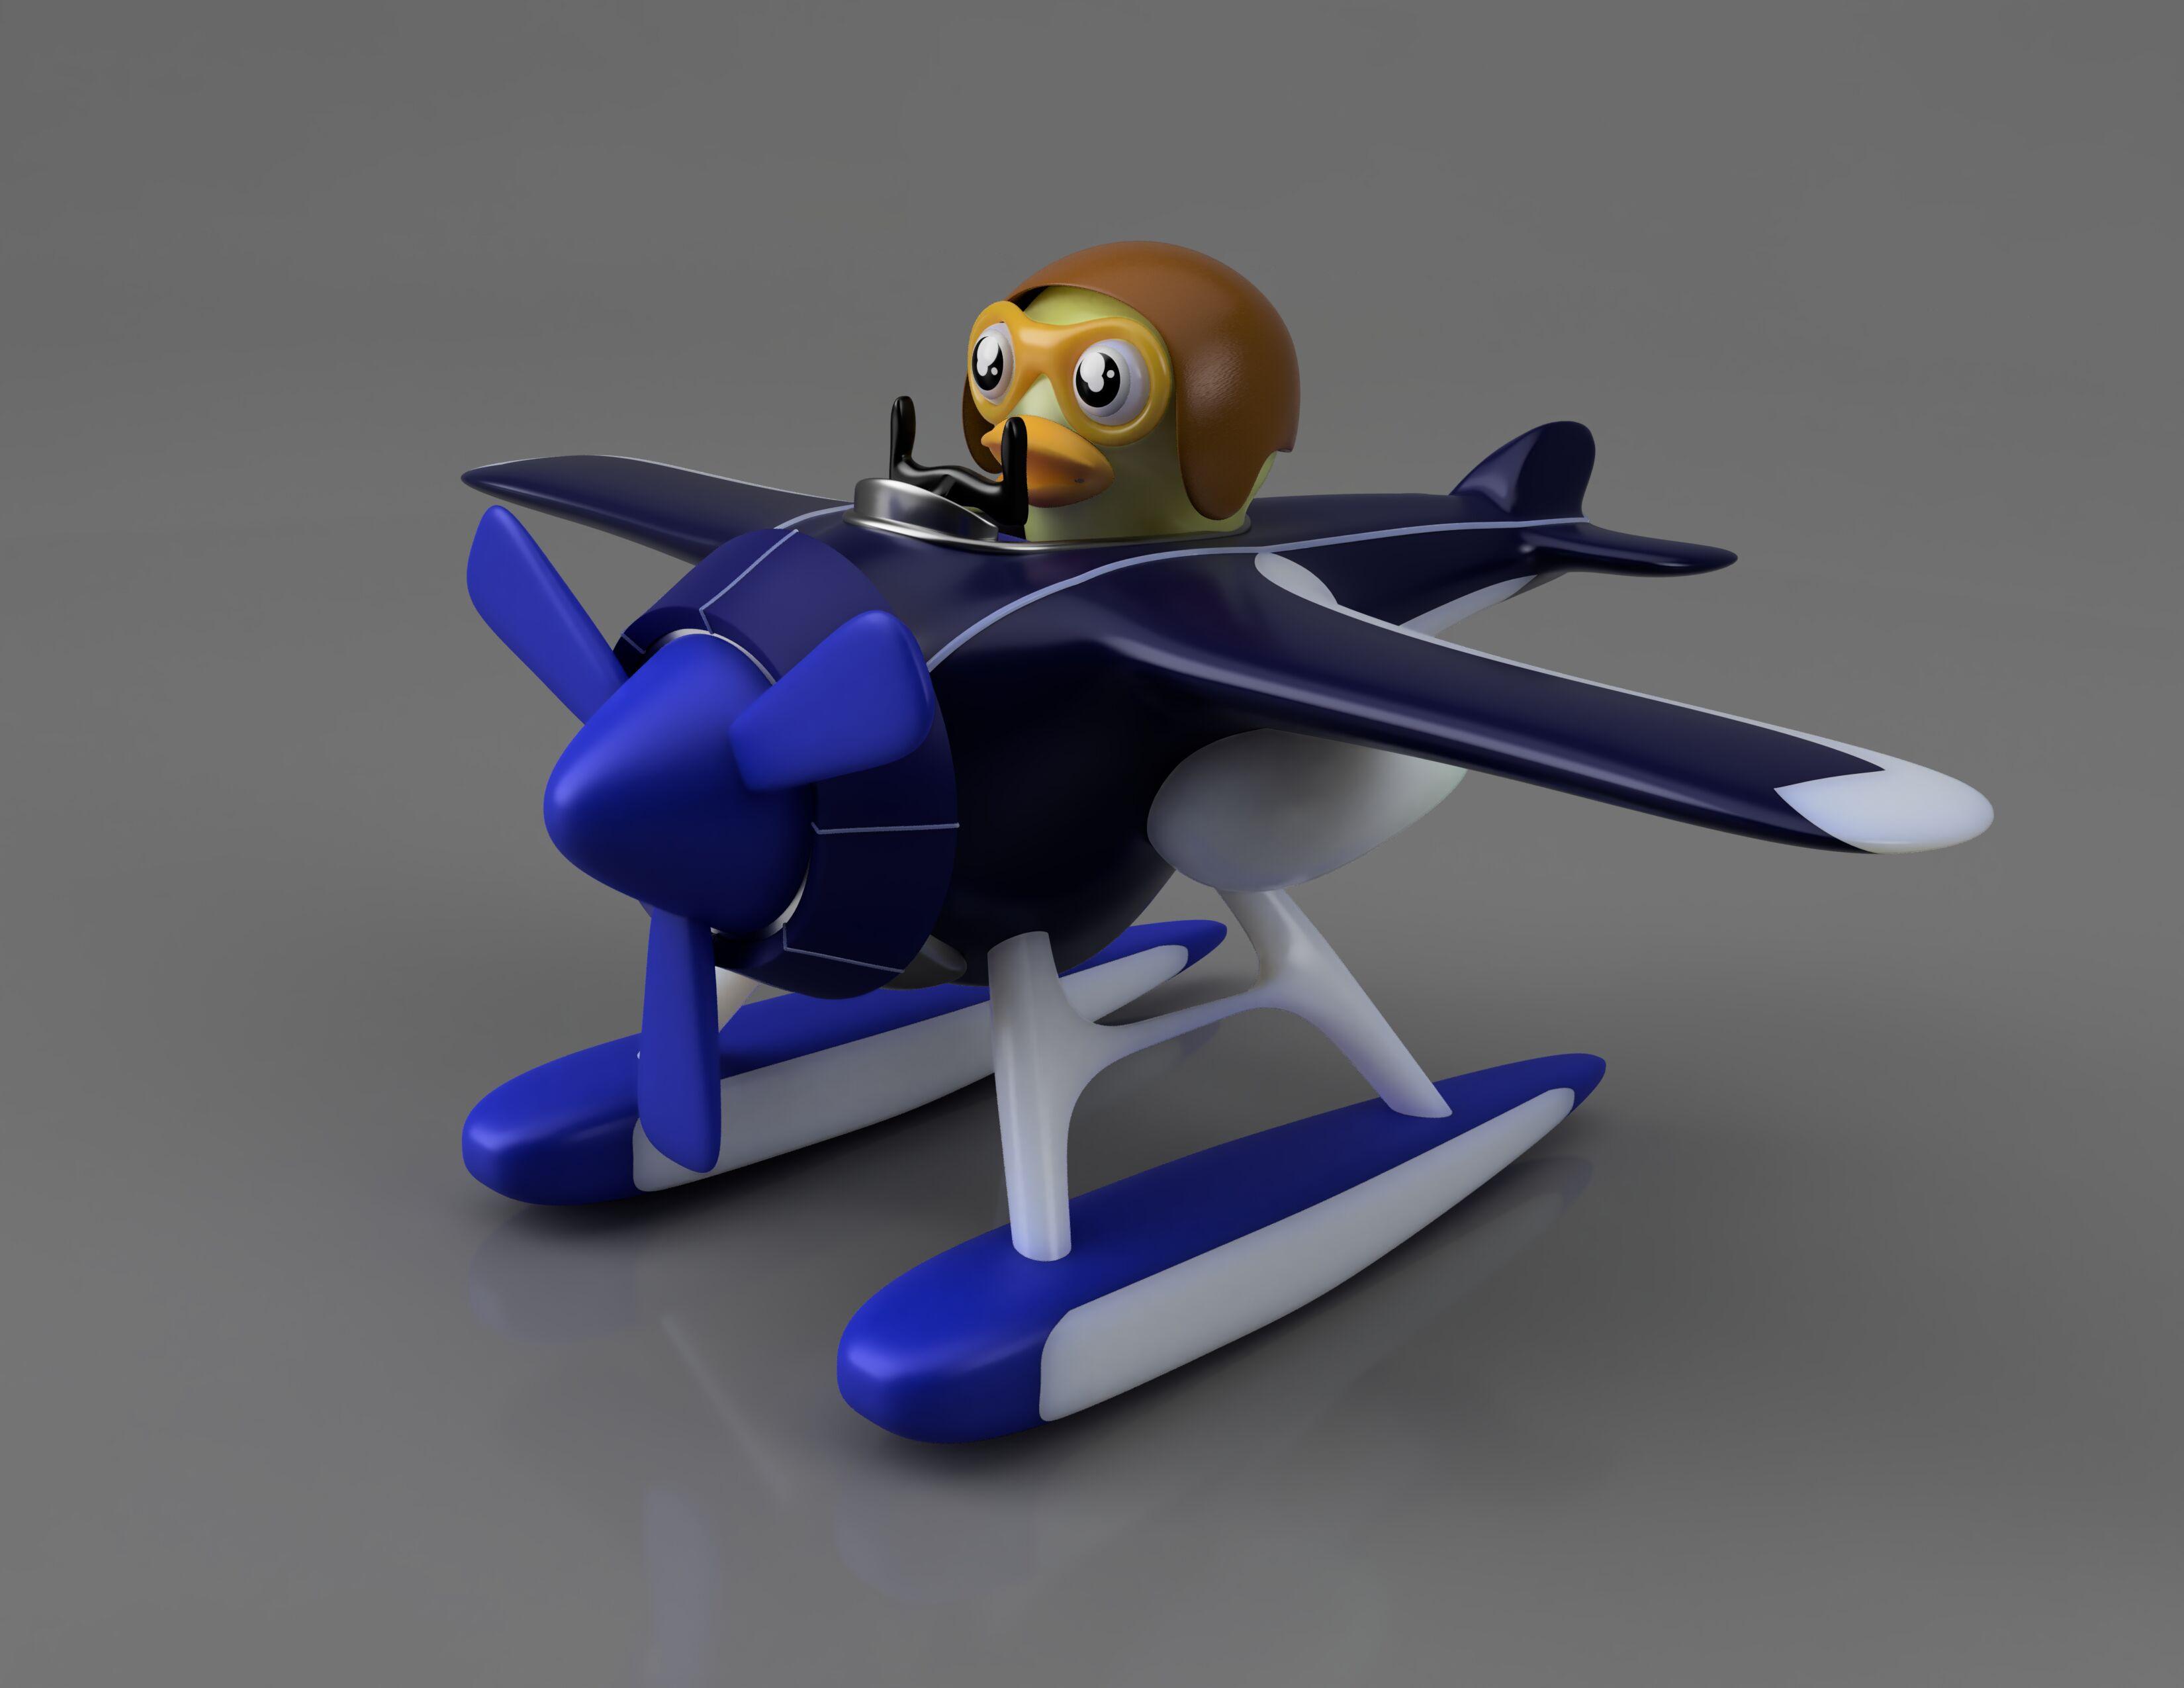 Avion-de-juguete--render-2020-jun-29-09-16-38pm-000-customizedview32972764502-png-3500-3500